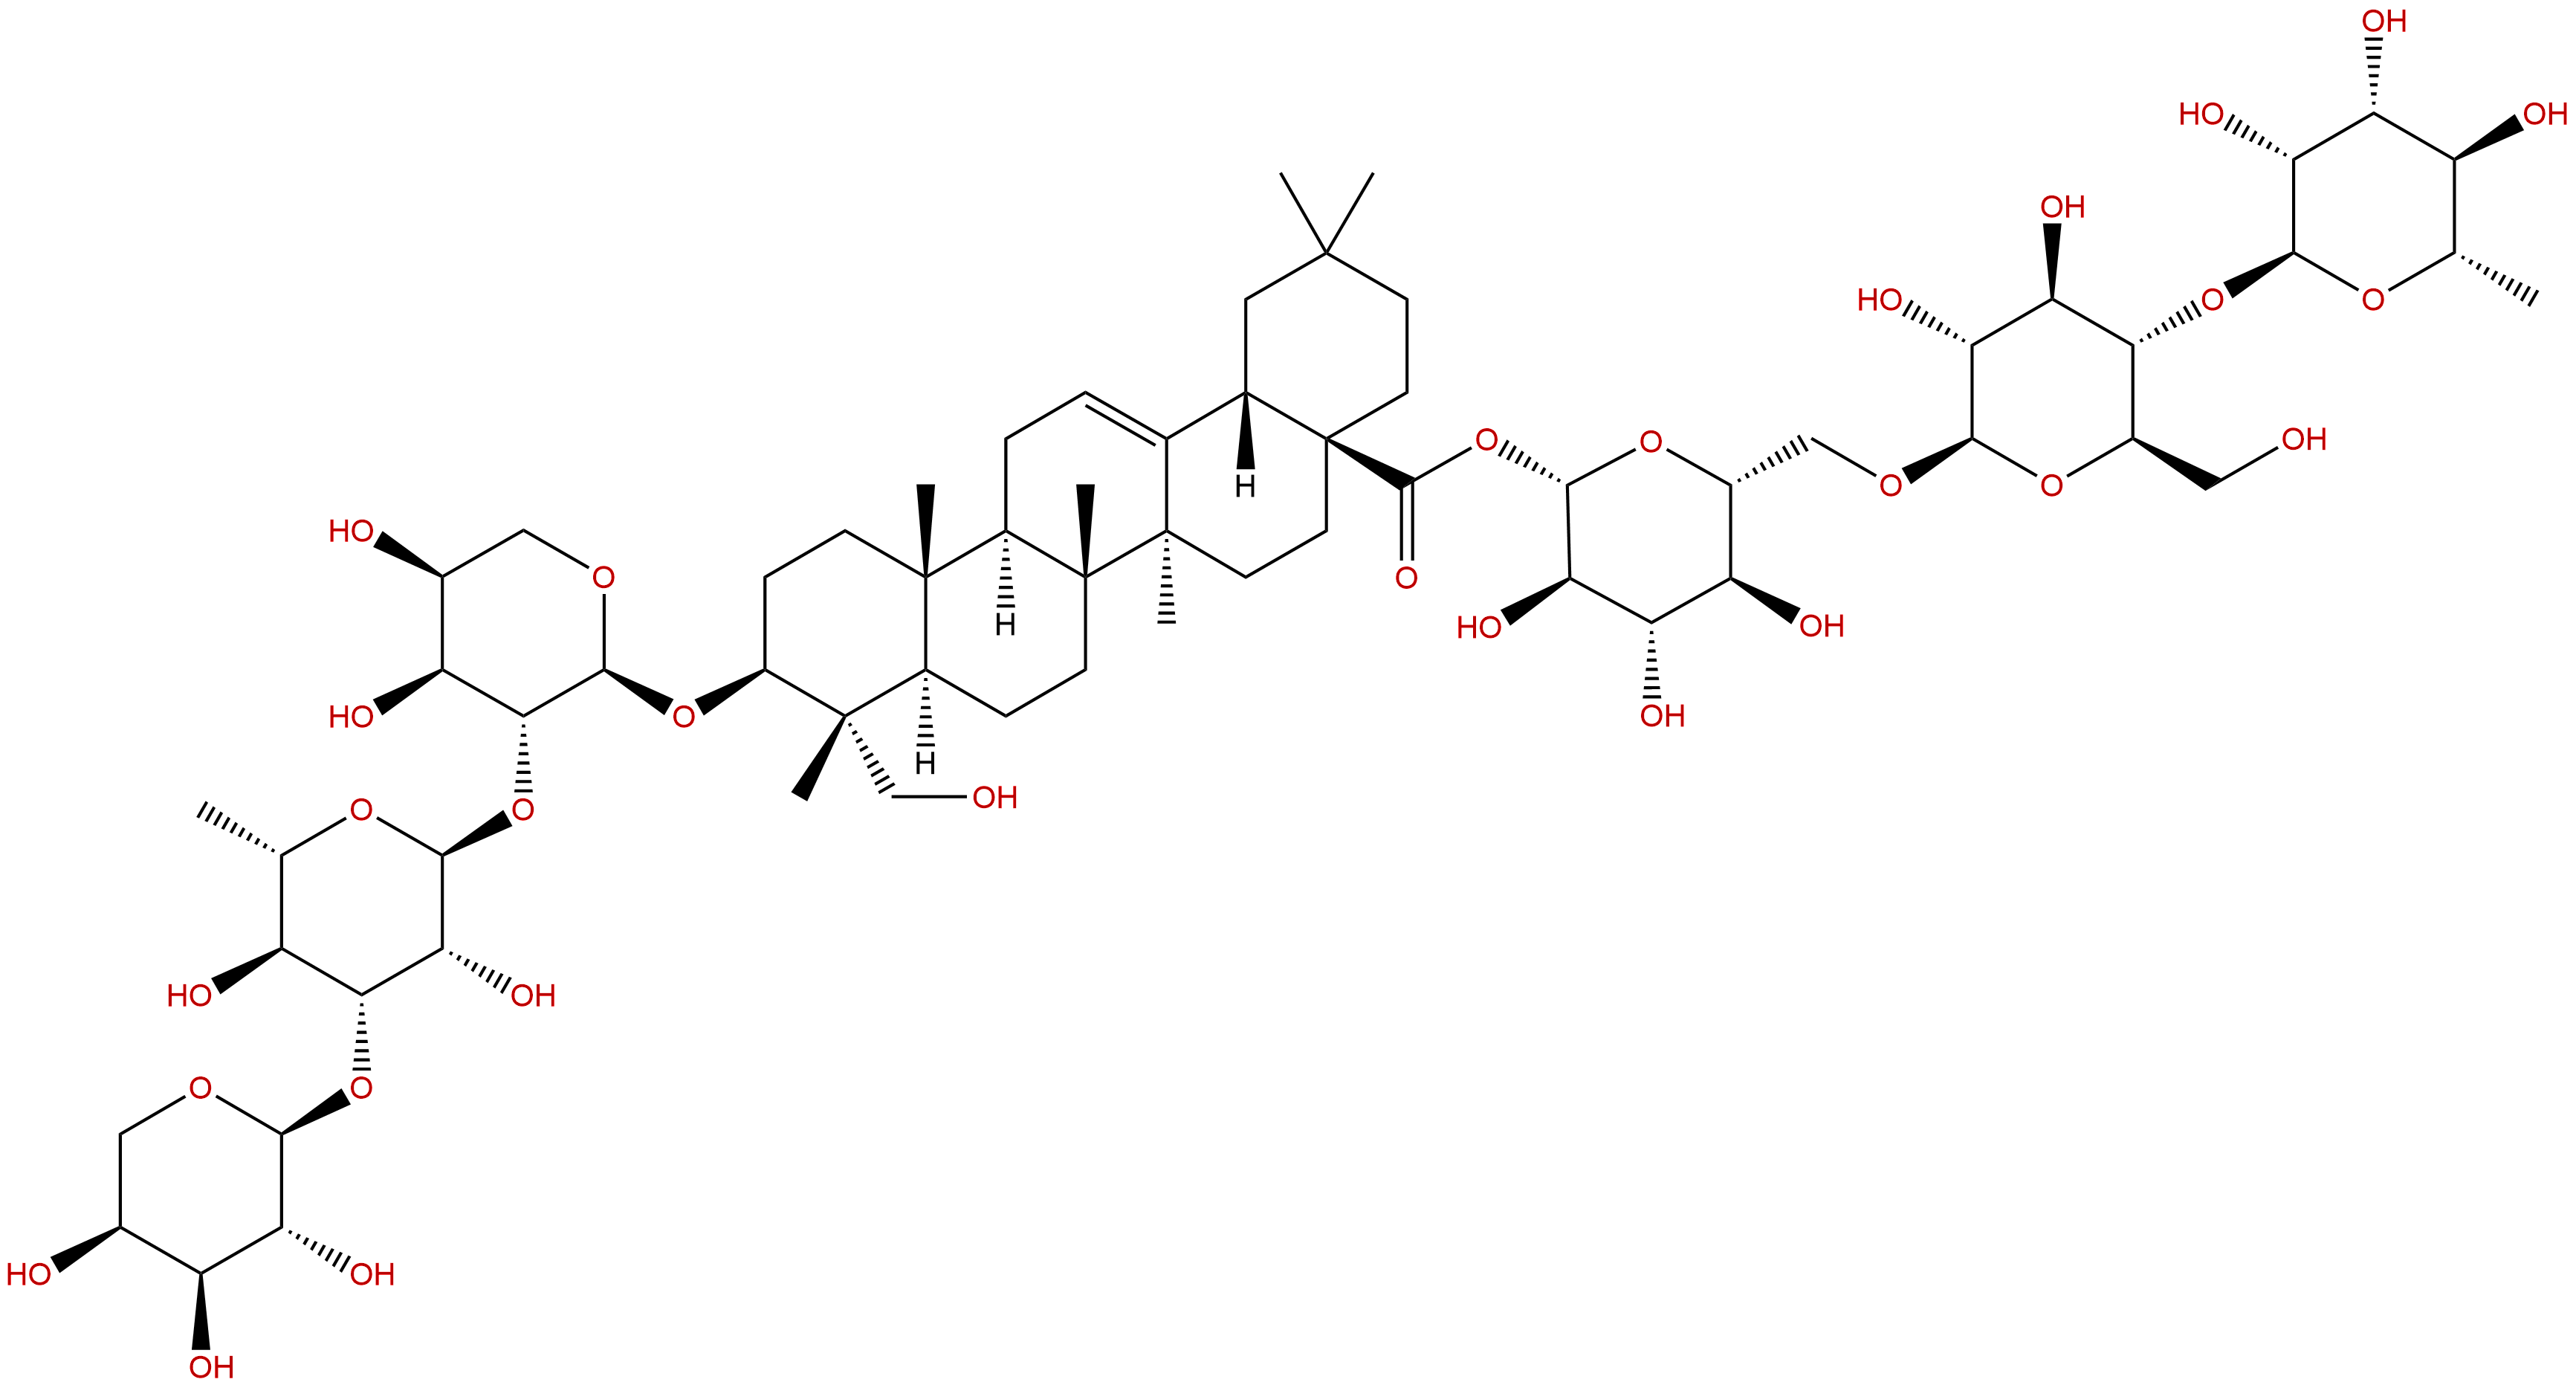 Huzhangoside D